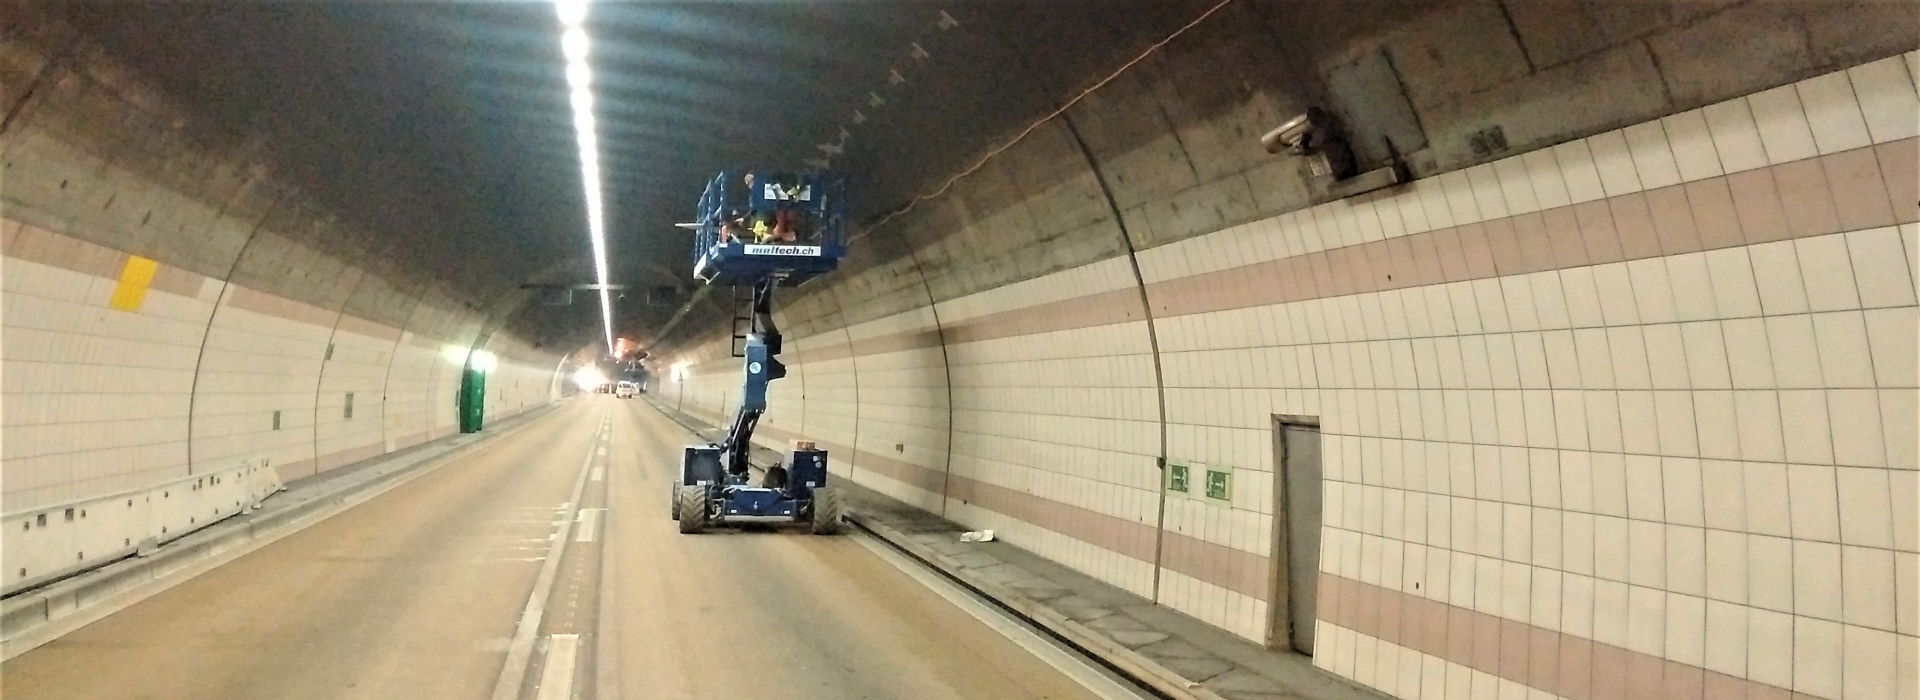 615-Tunnel Vernier (2)